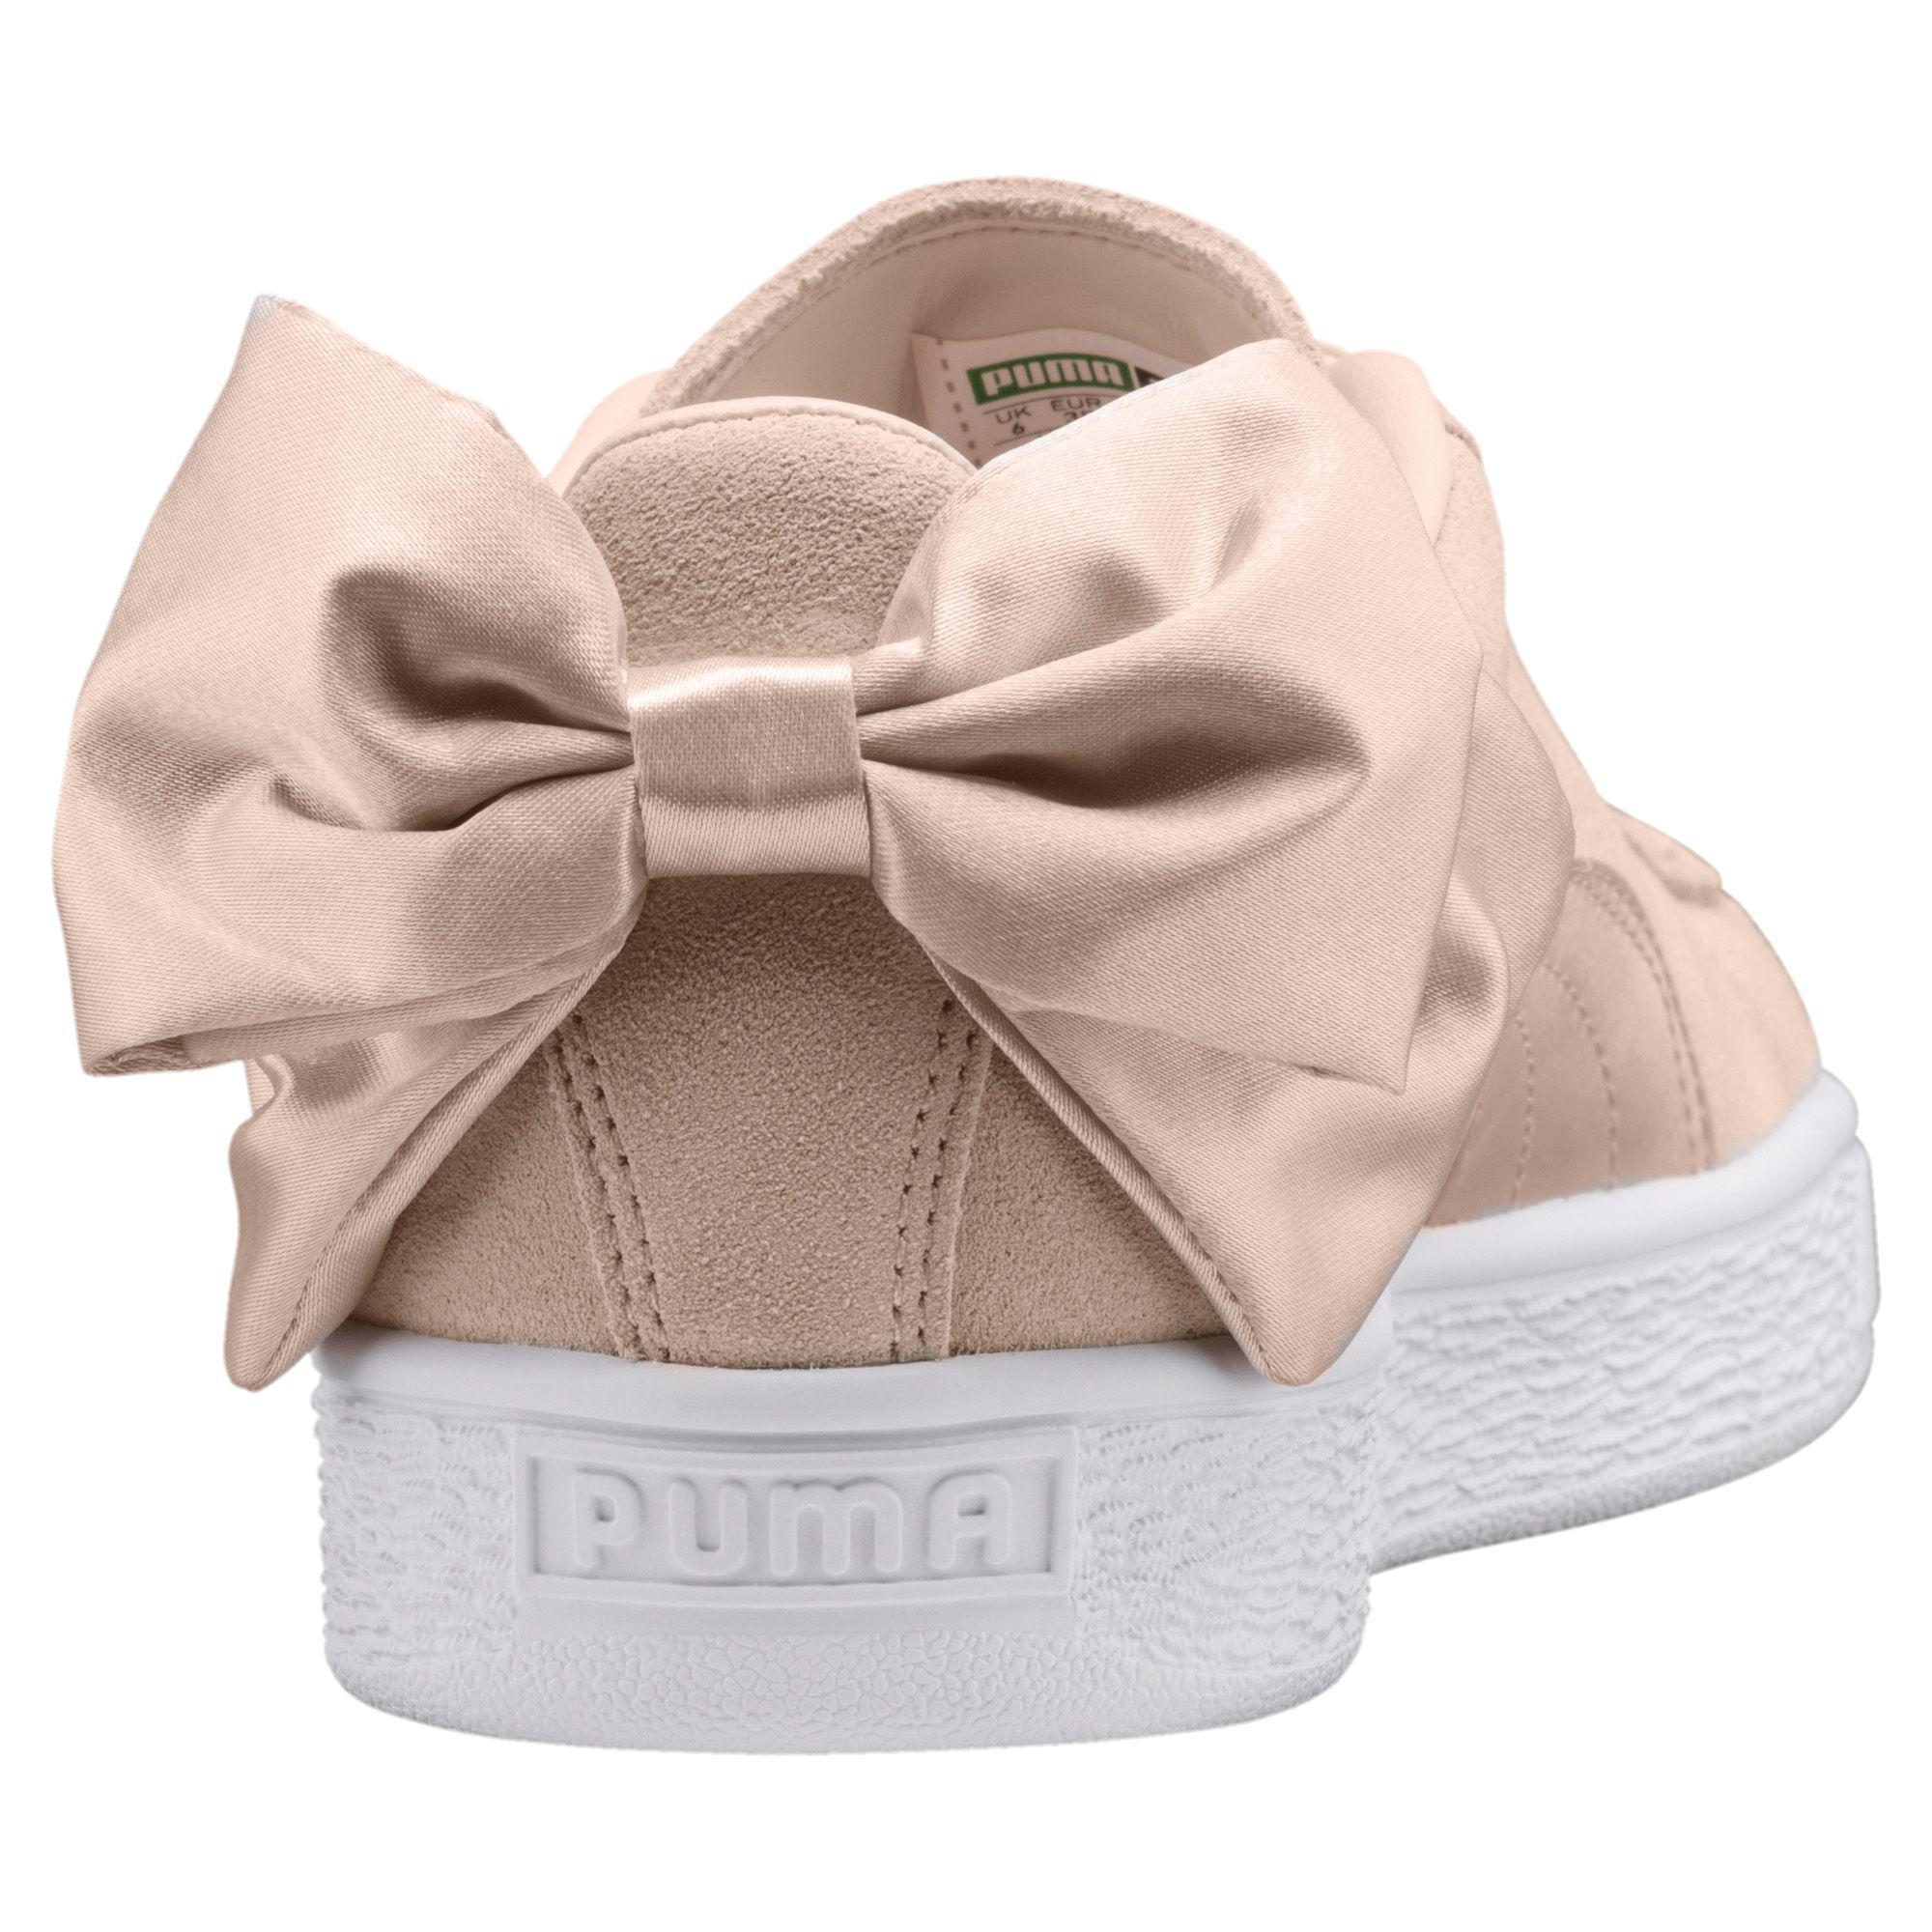 013b556cbe6 Lyst - PUMA Suede Bow Valentine Women s Sneakers